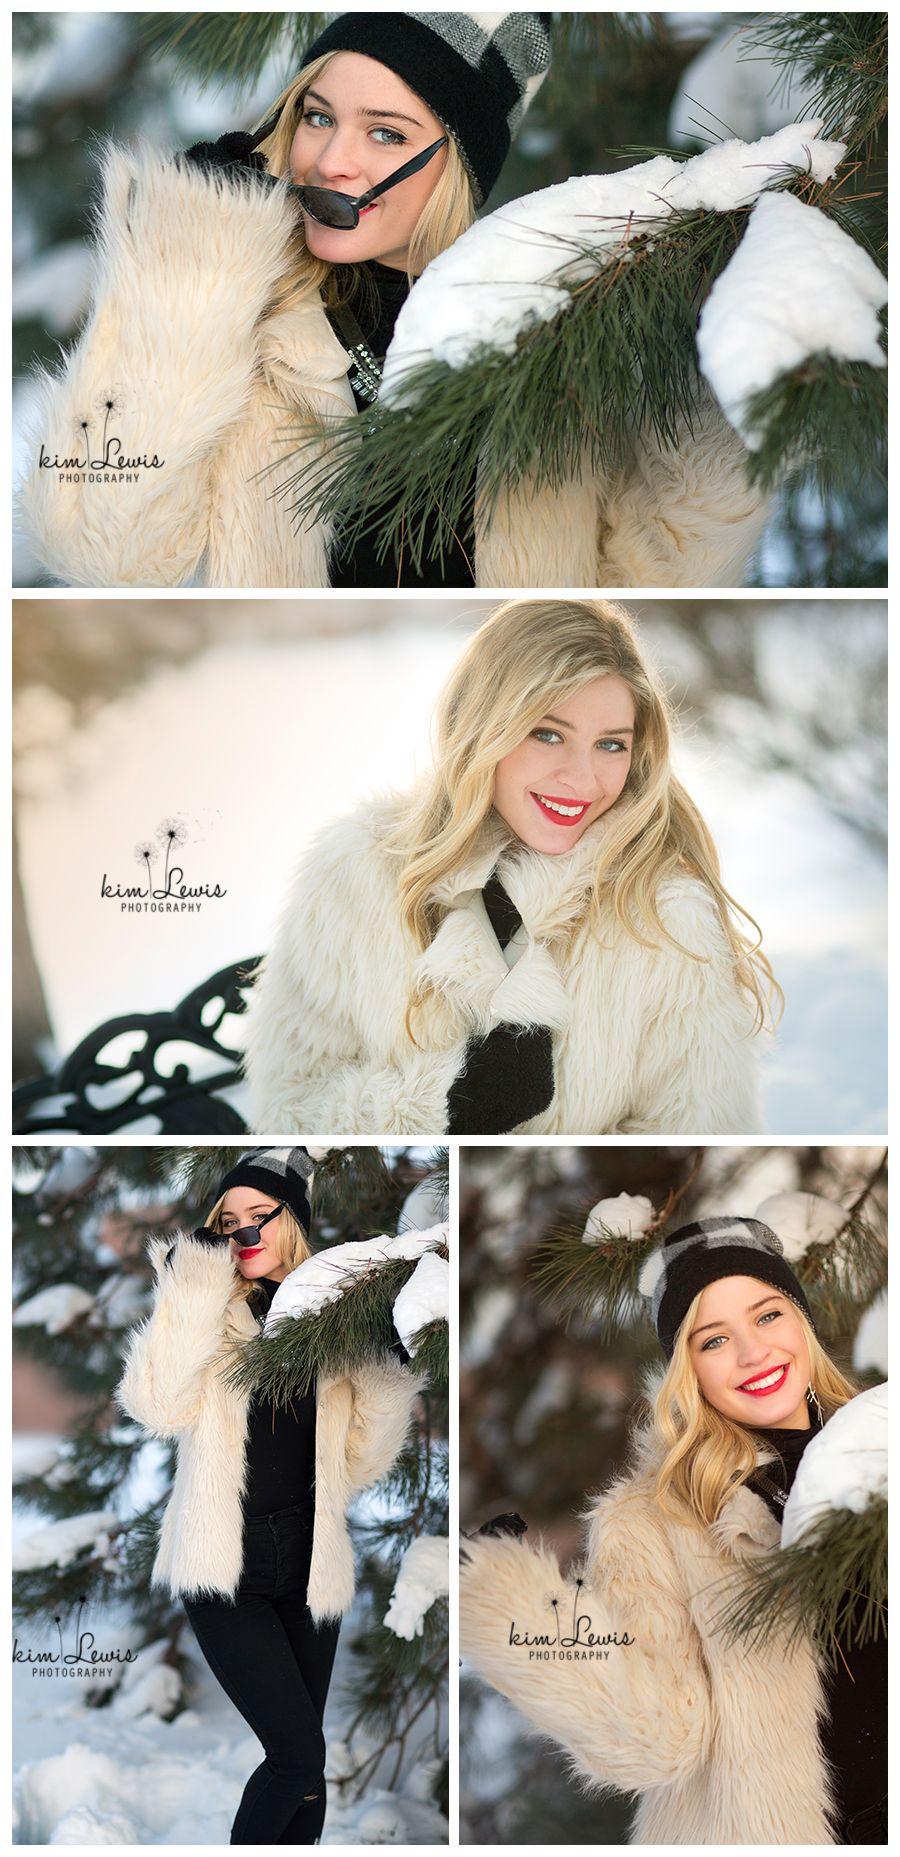 High School Senior Pics Kim Lewis Photography Orland